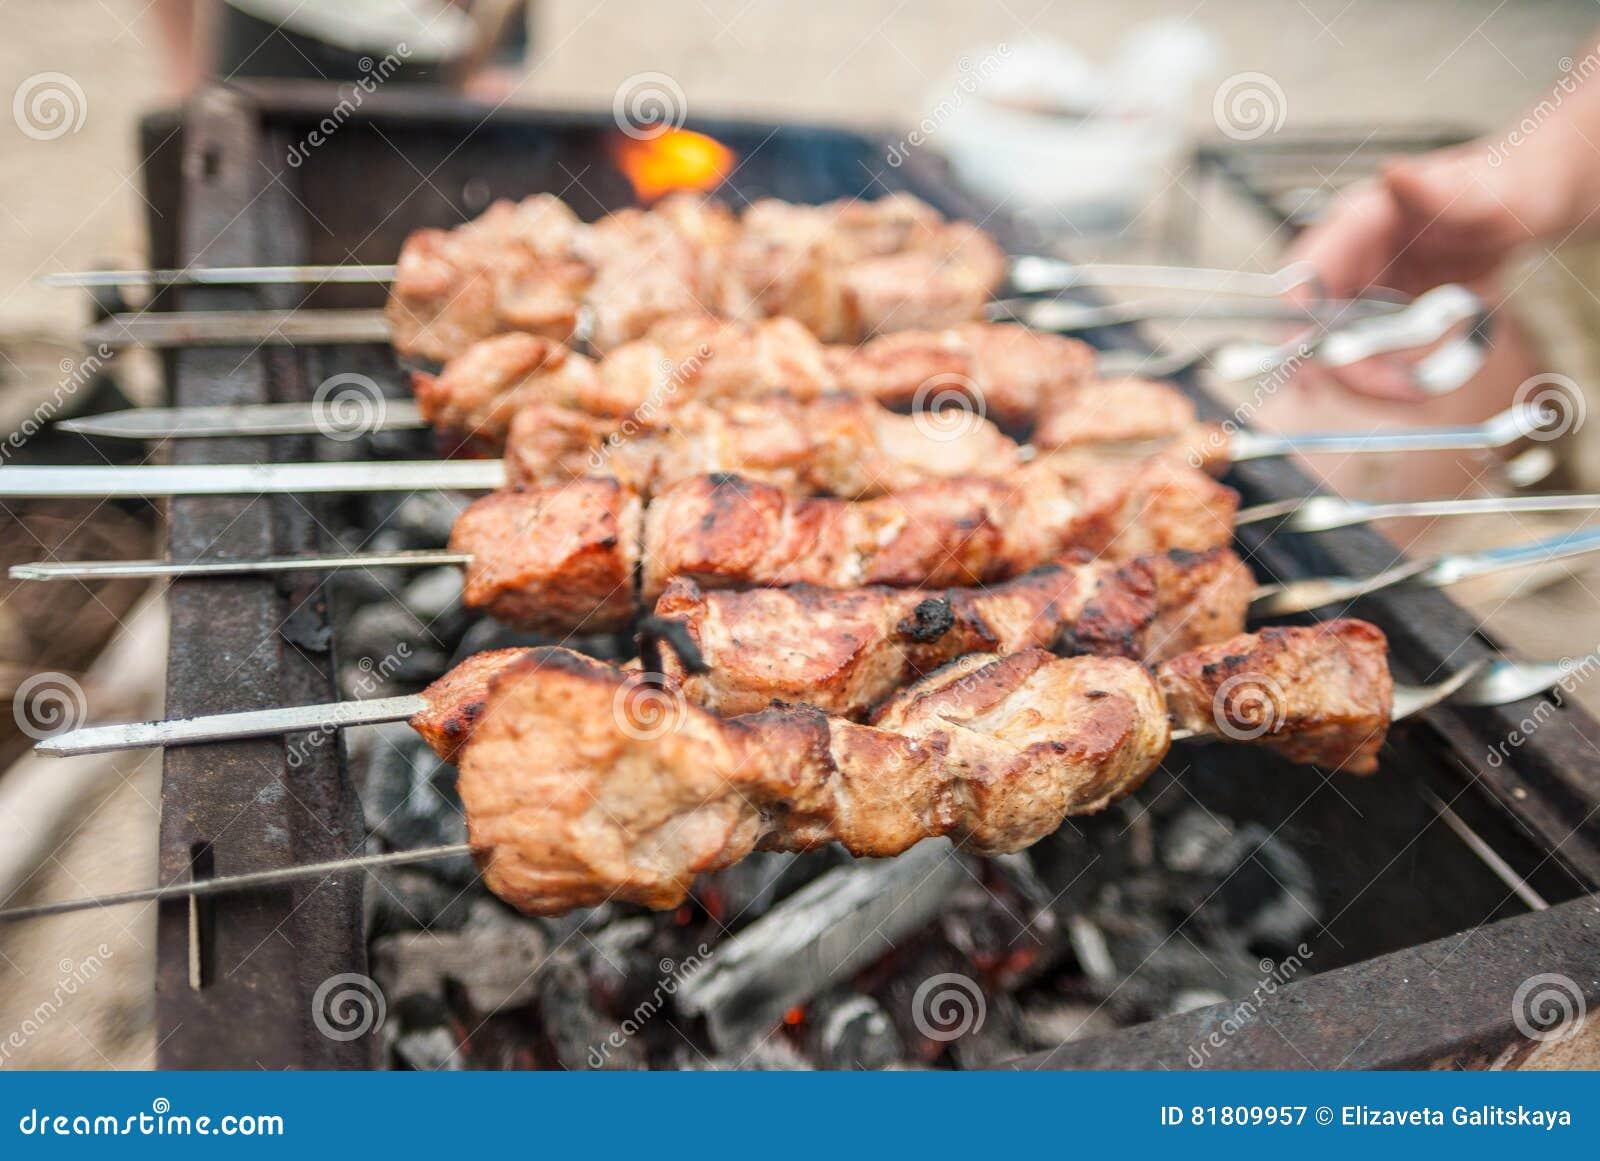 Kebabs на протыкальниках над углем на снаружи